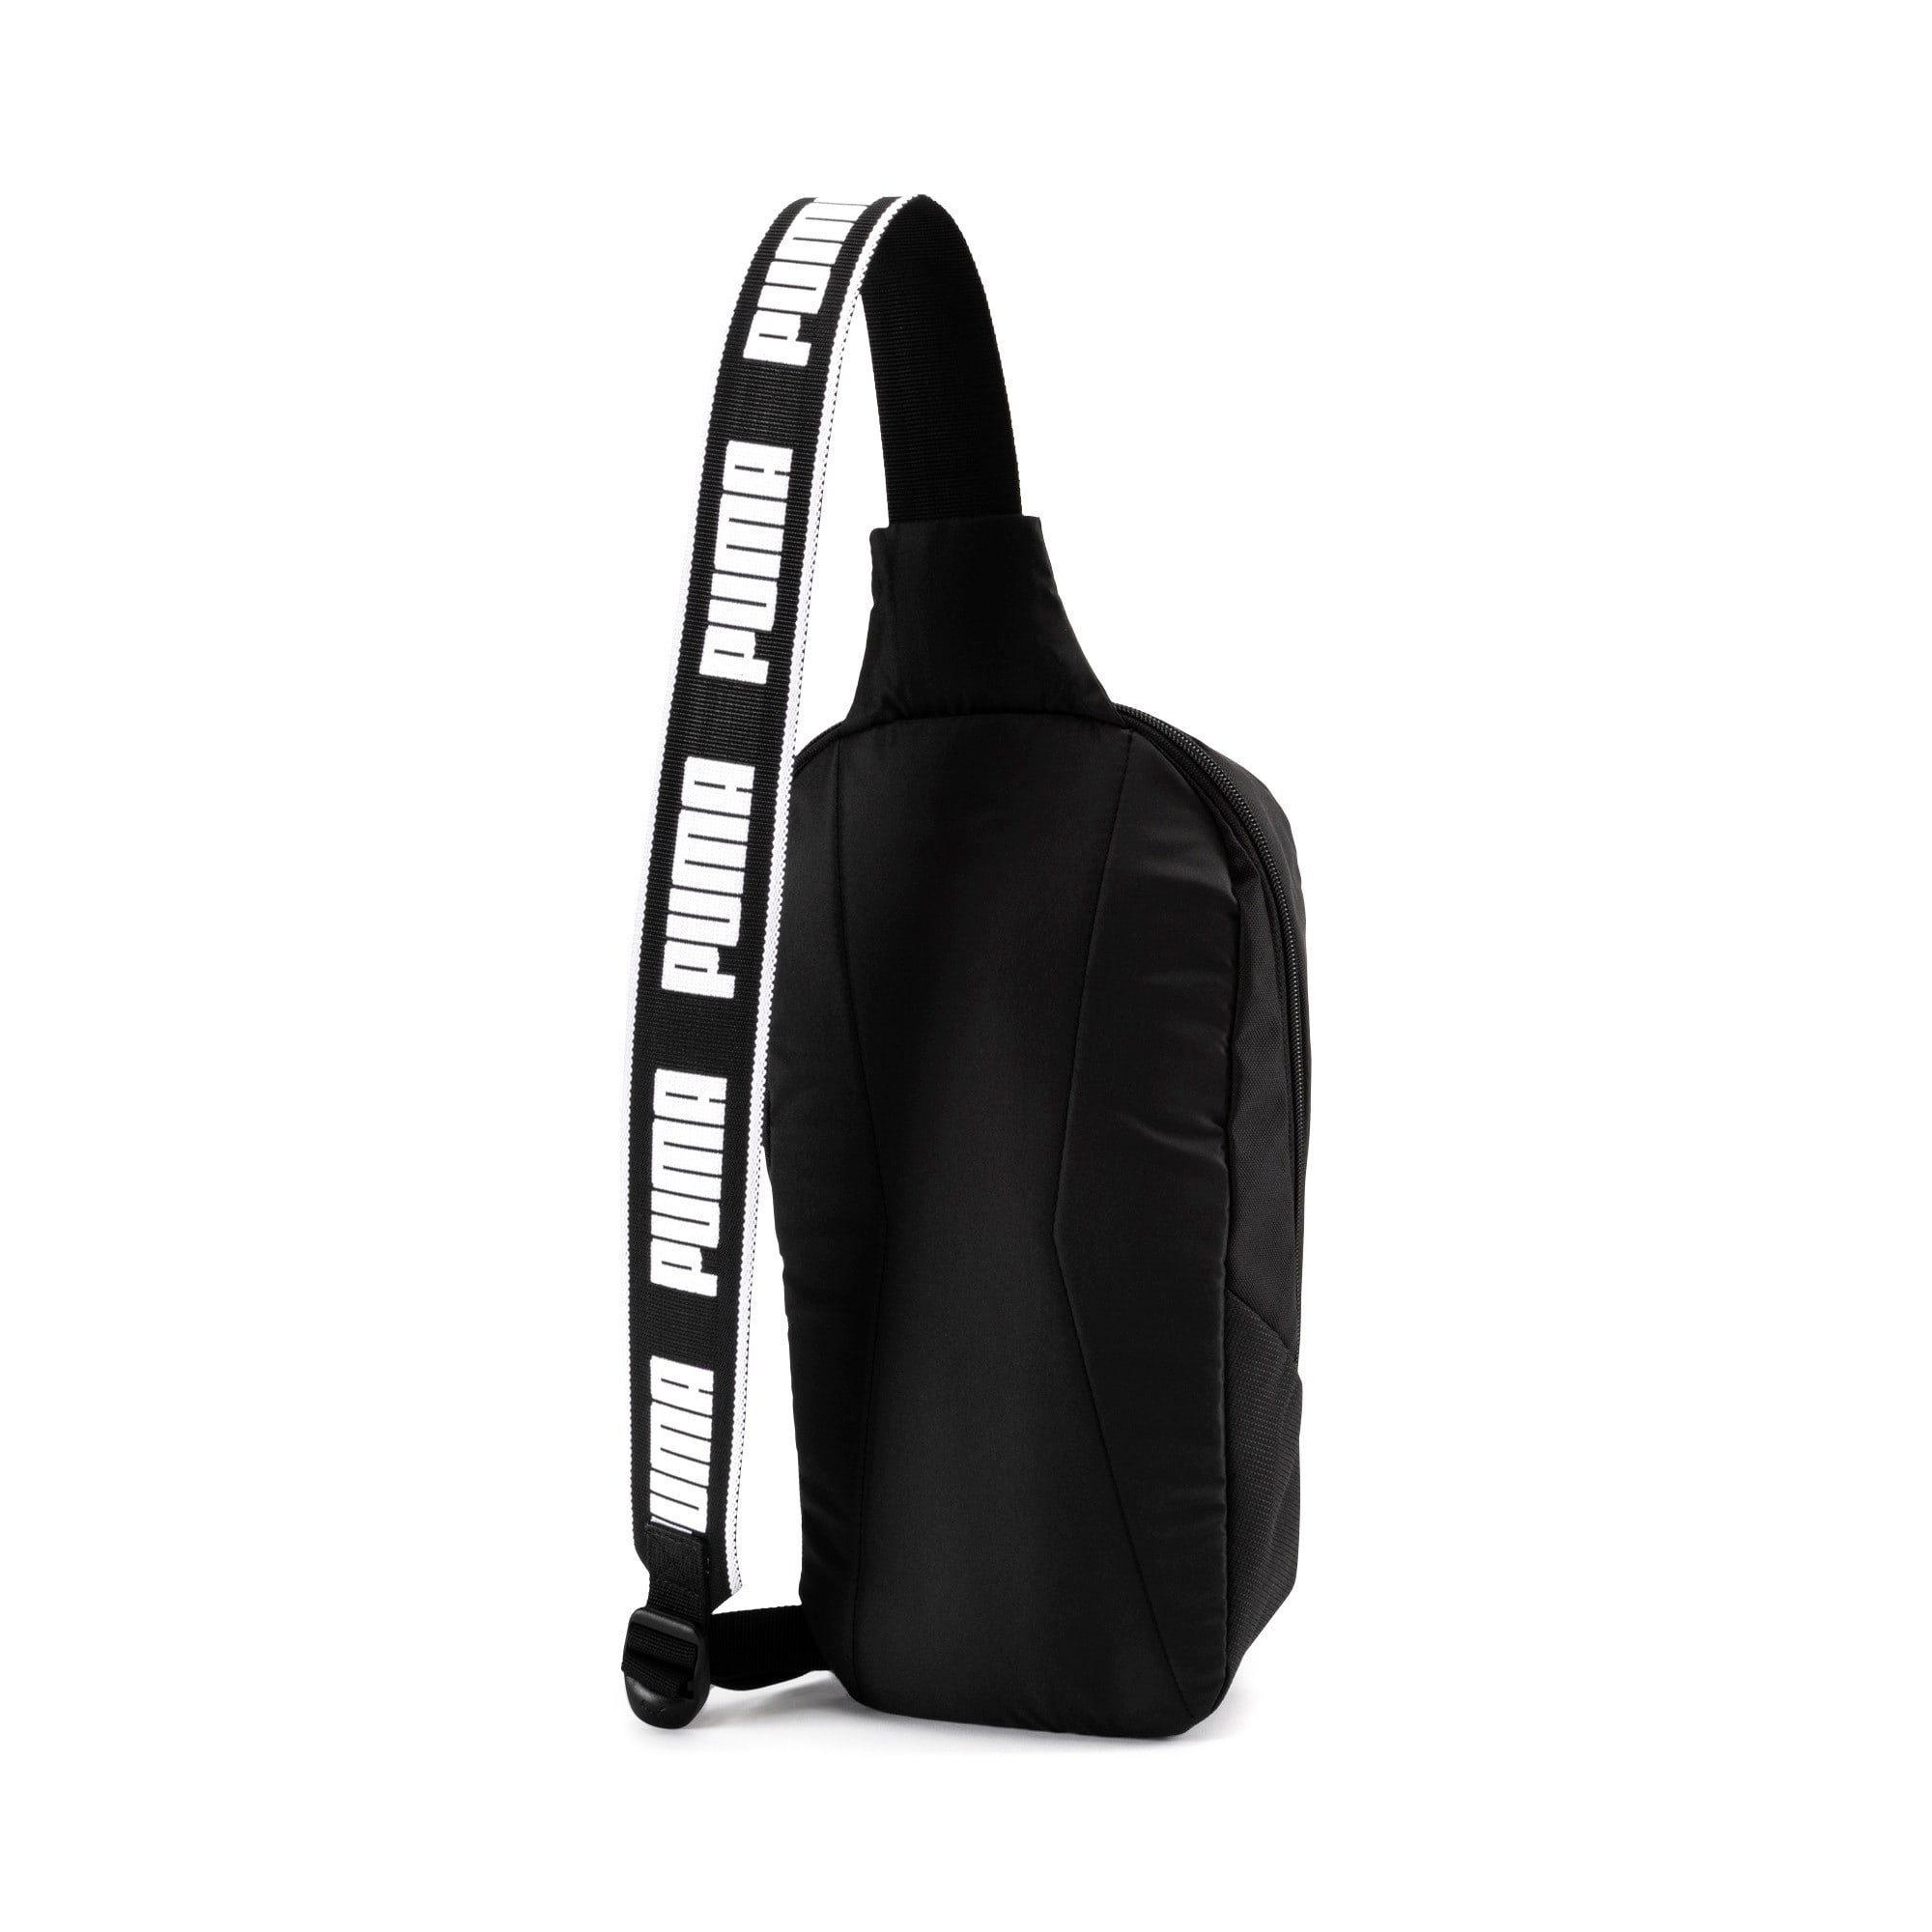 Thumbnail 2 of PUMA Sole Cross Body Bag, Puma Black, medium